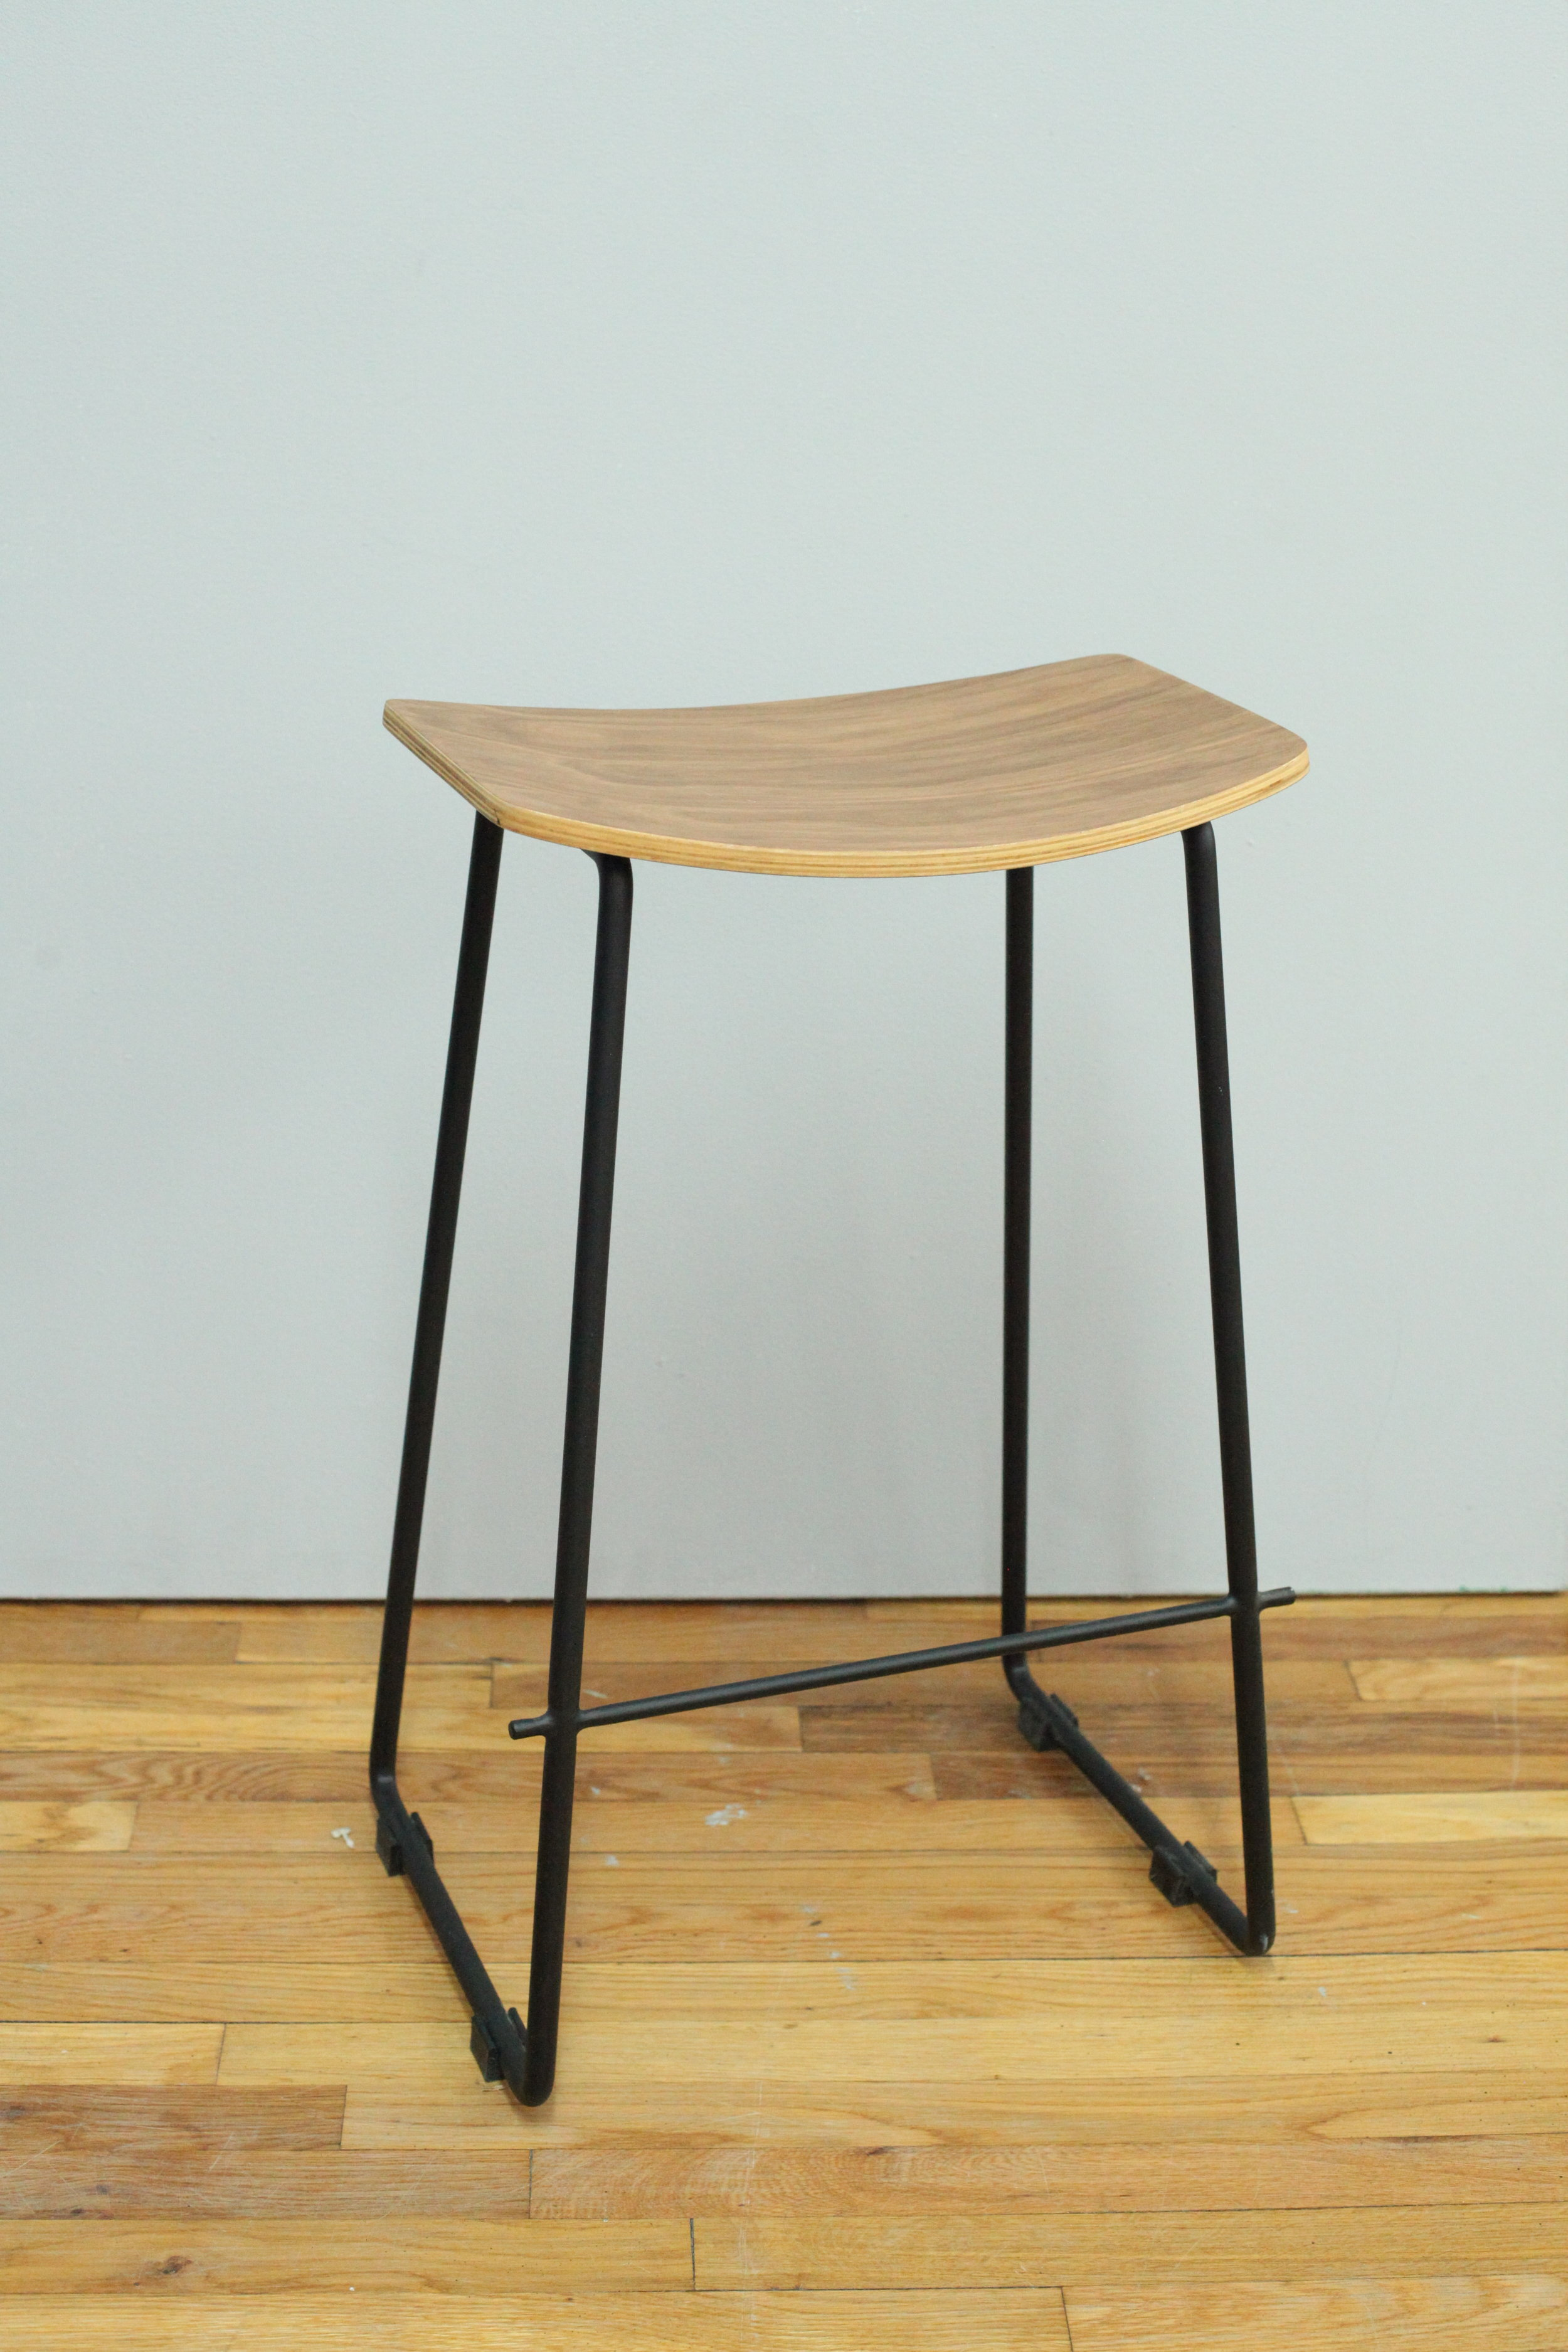 Rectangular wood + black steel stool  $150